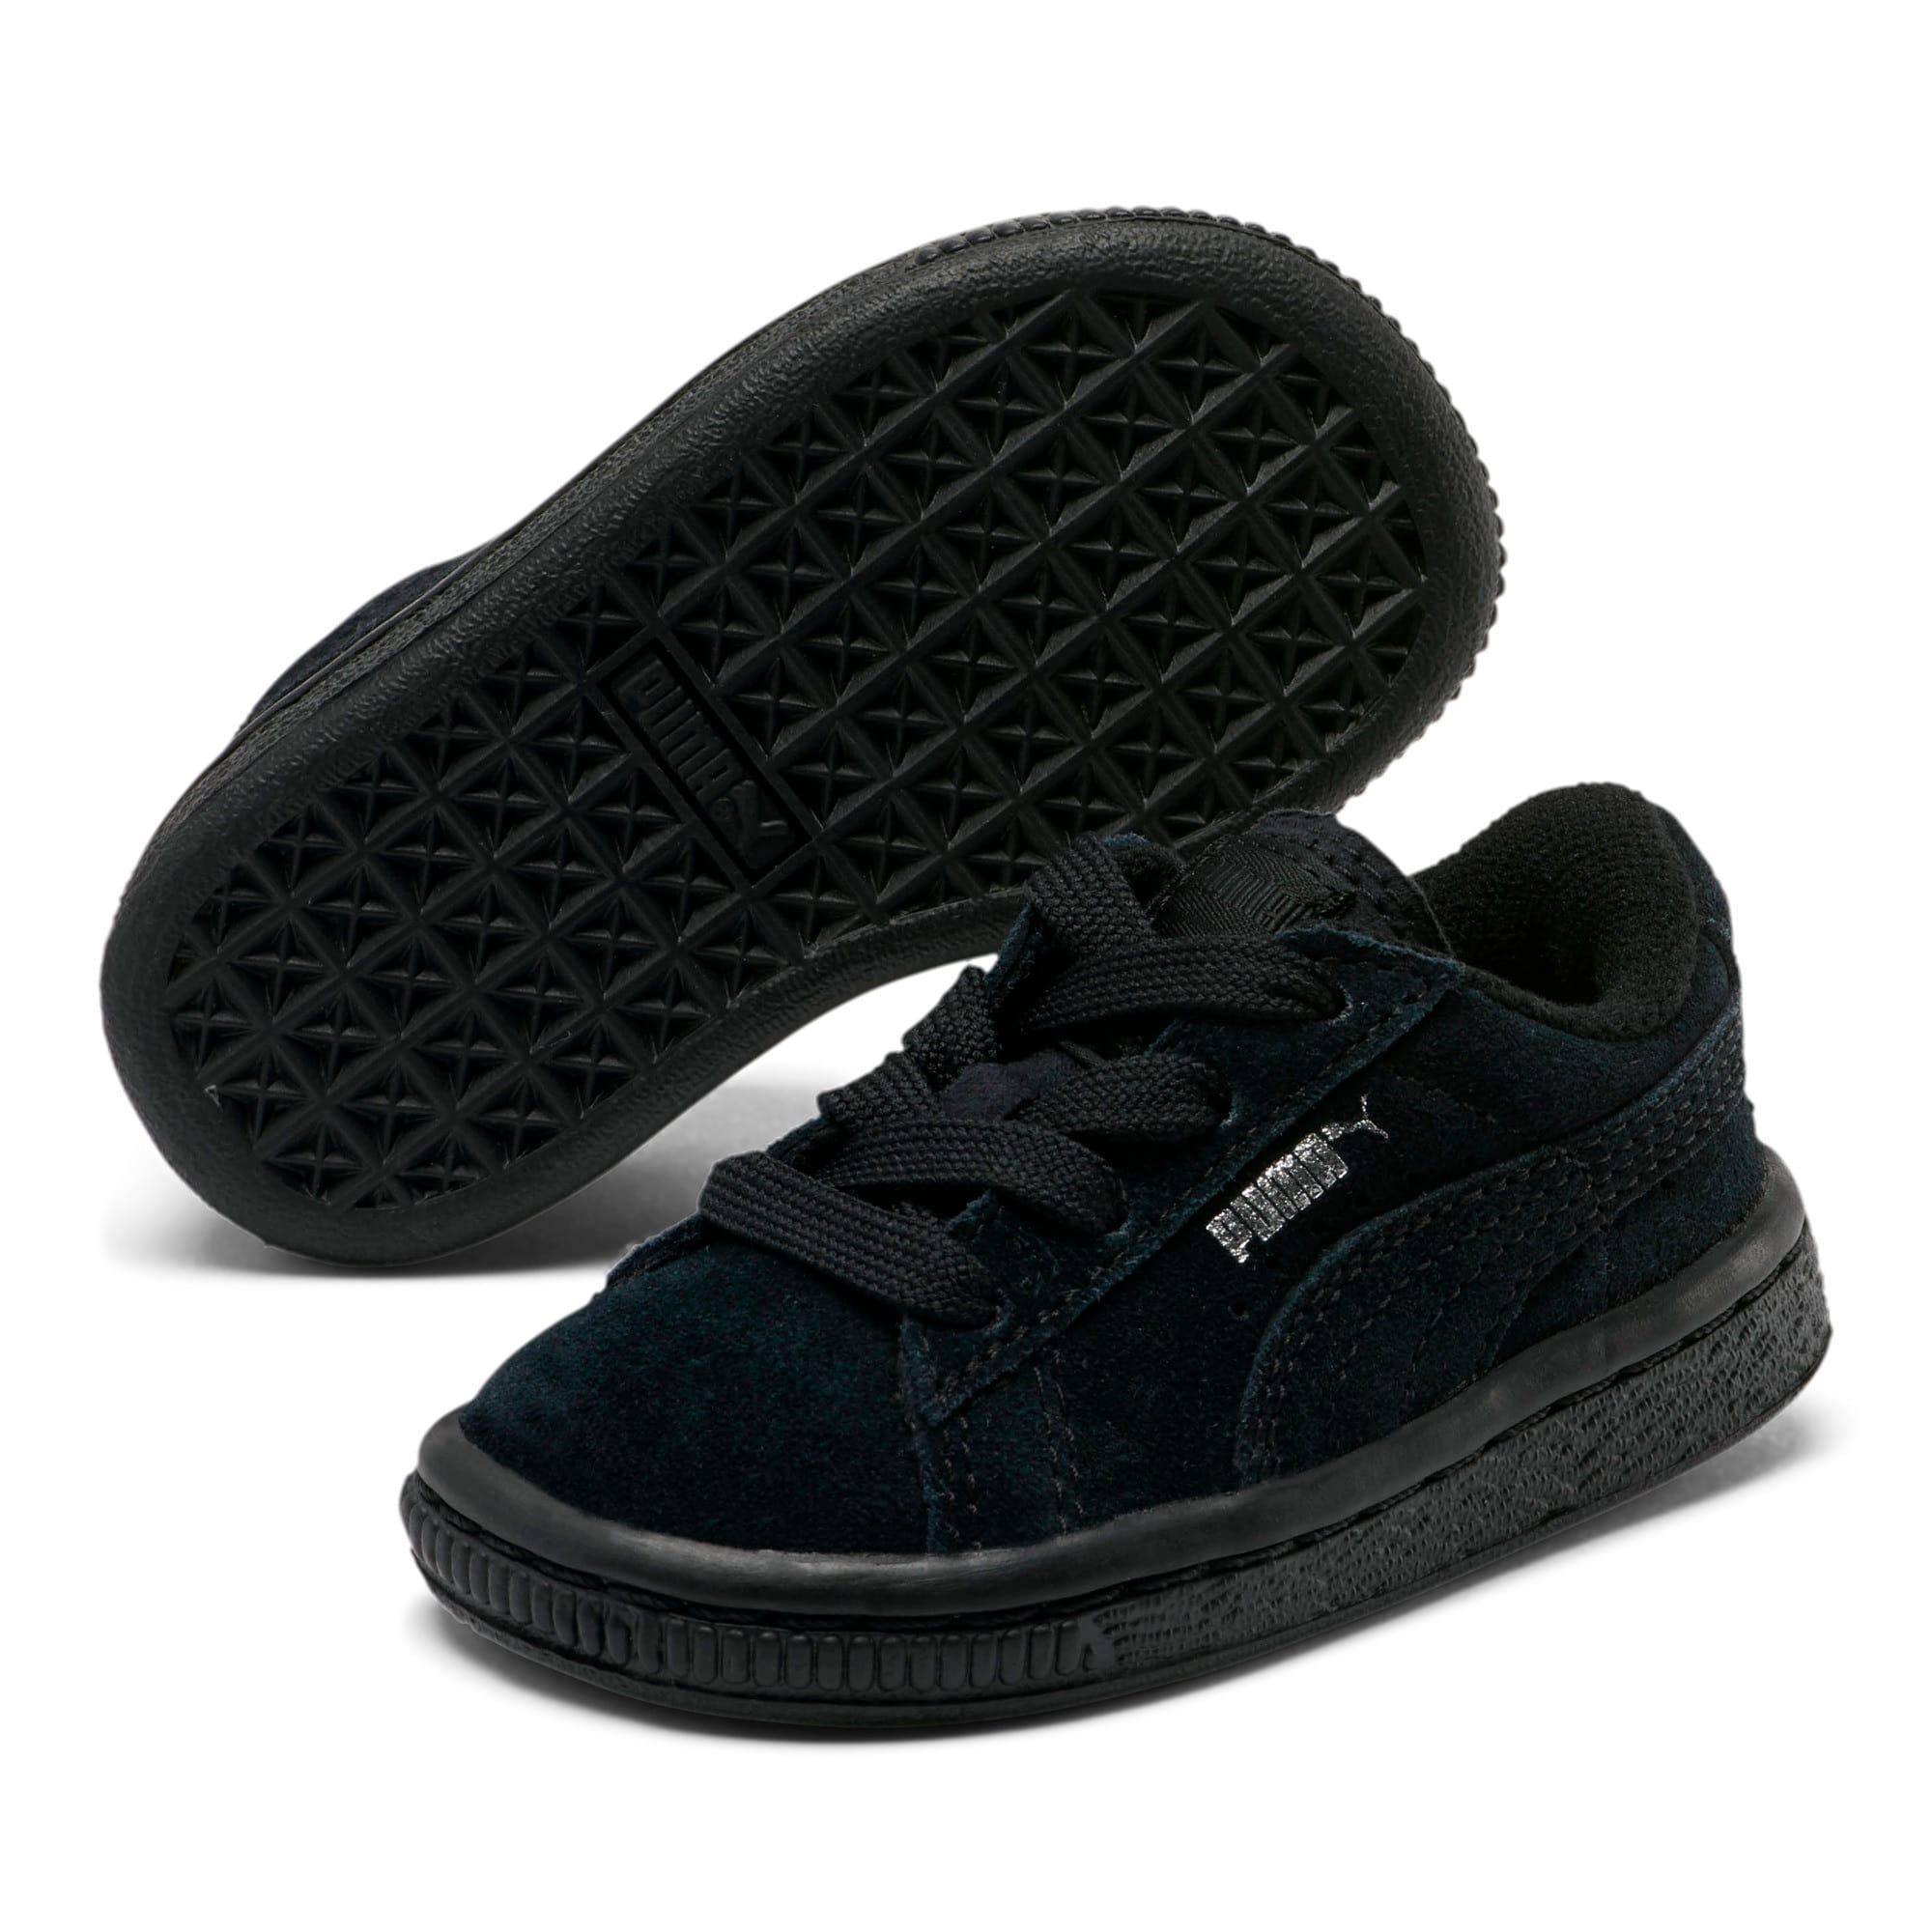 Thumbnail 5 of Puma Suede Toddler Shoes, black-puma silver, medium